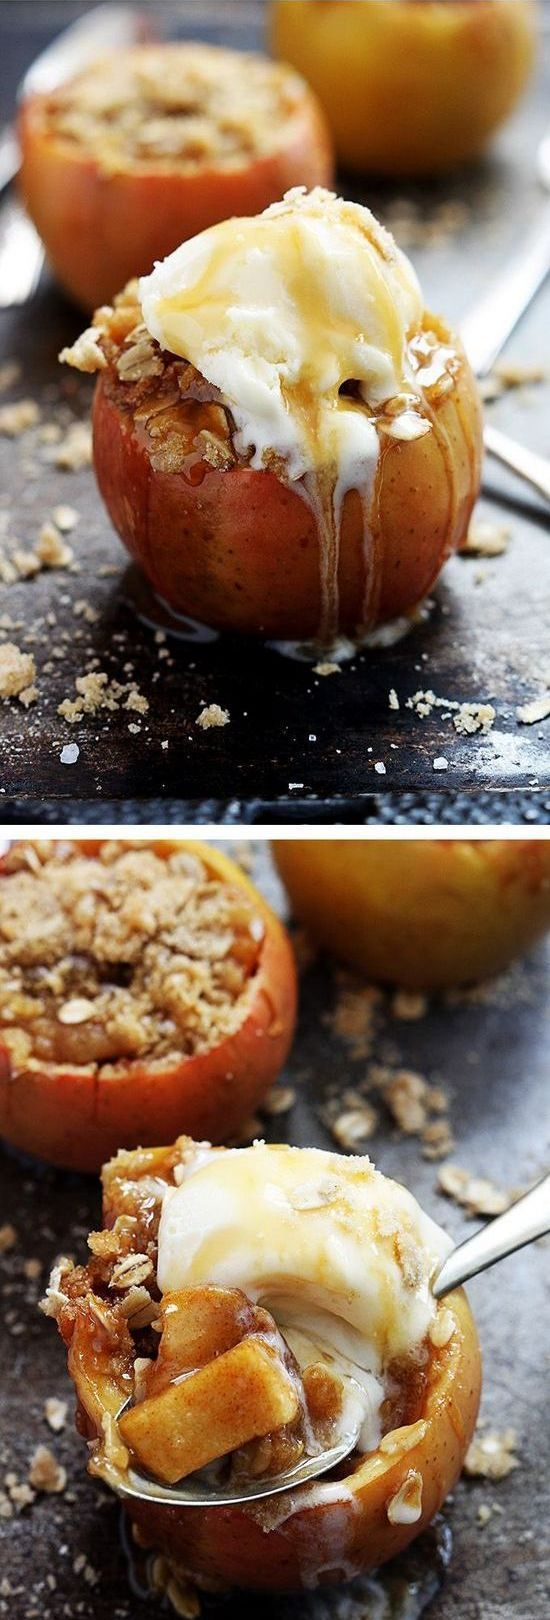 Apple Crisp Stuffed Apples #applecrisp #stuffed #dessert